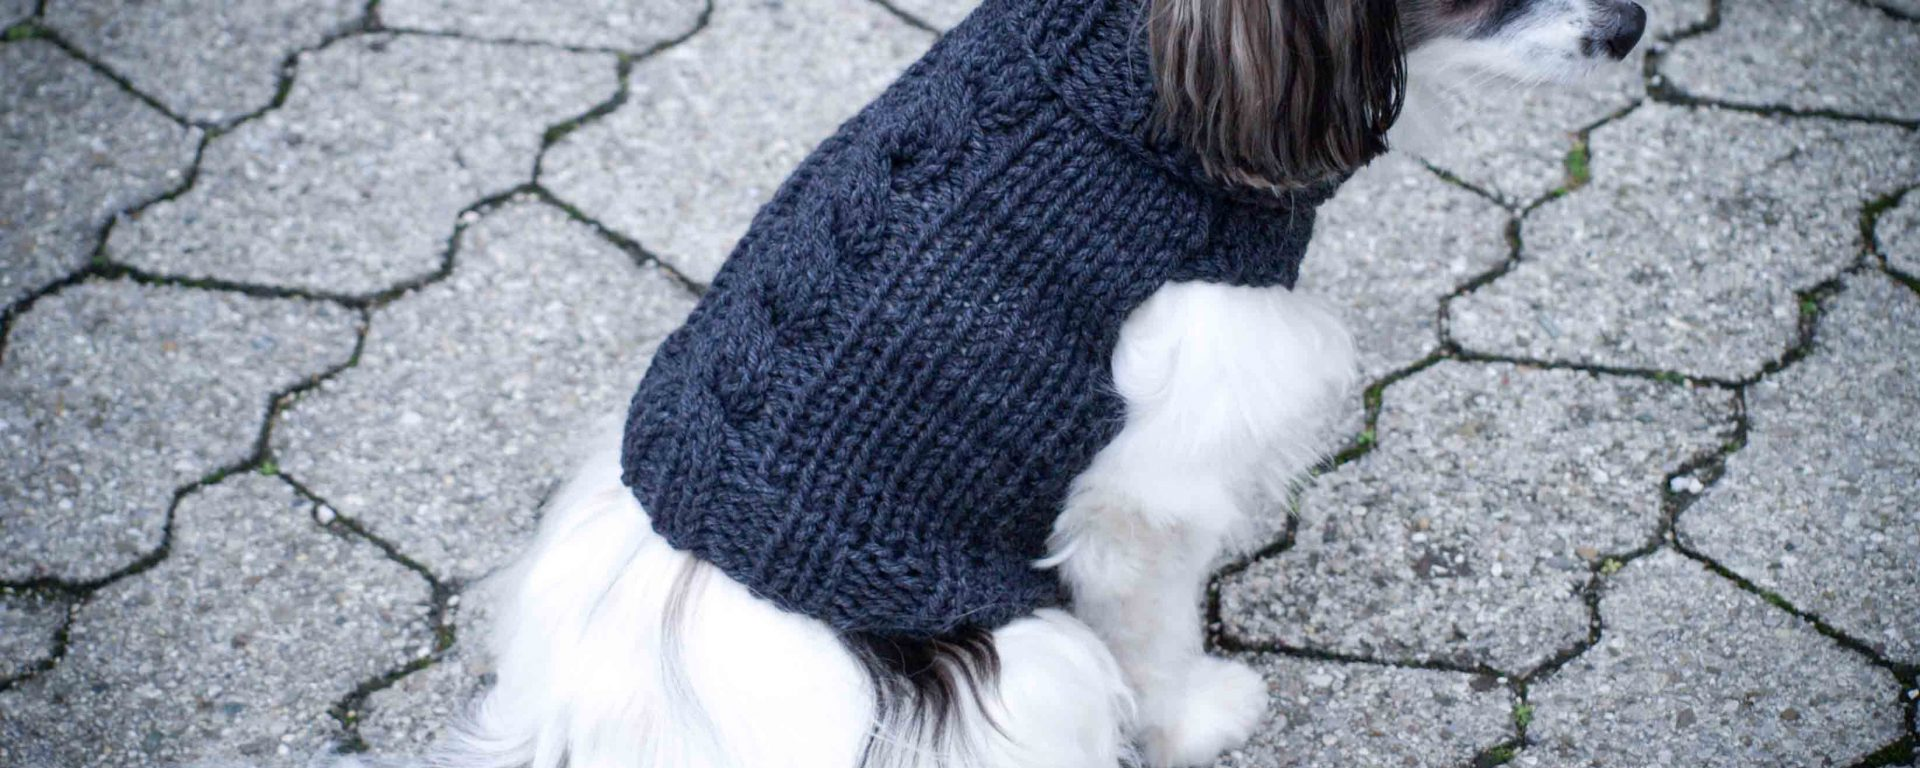 hundepullover stricken